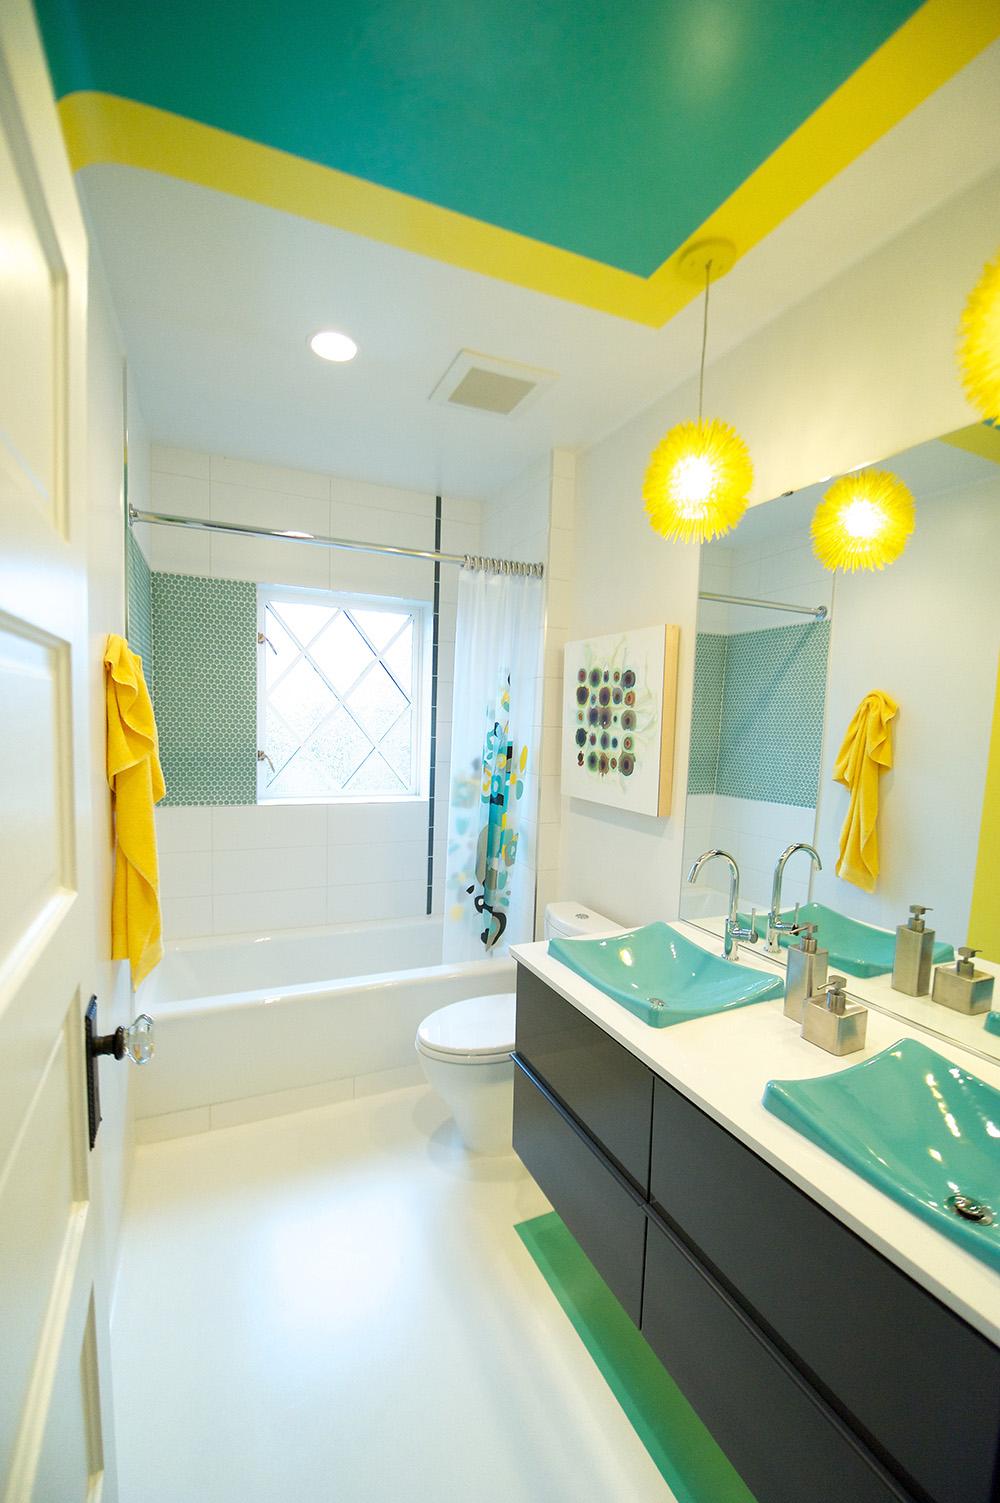 50 Best Bathroom Design Ideas For 2016